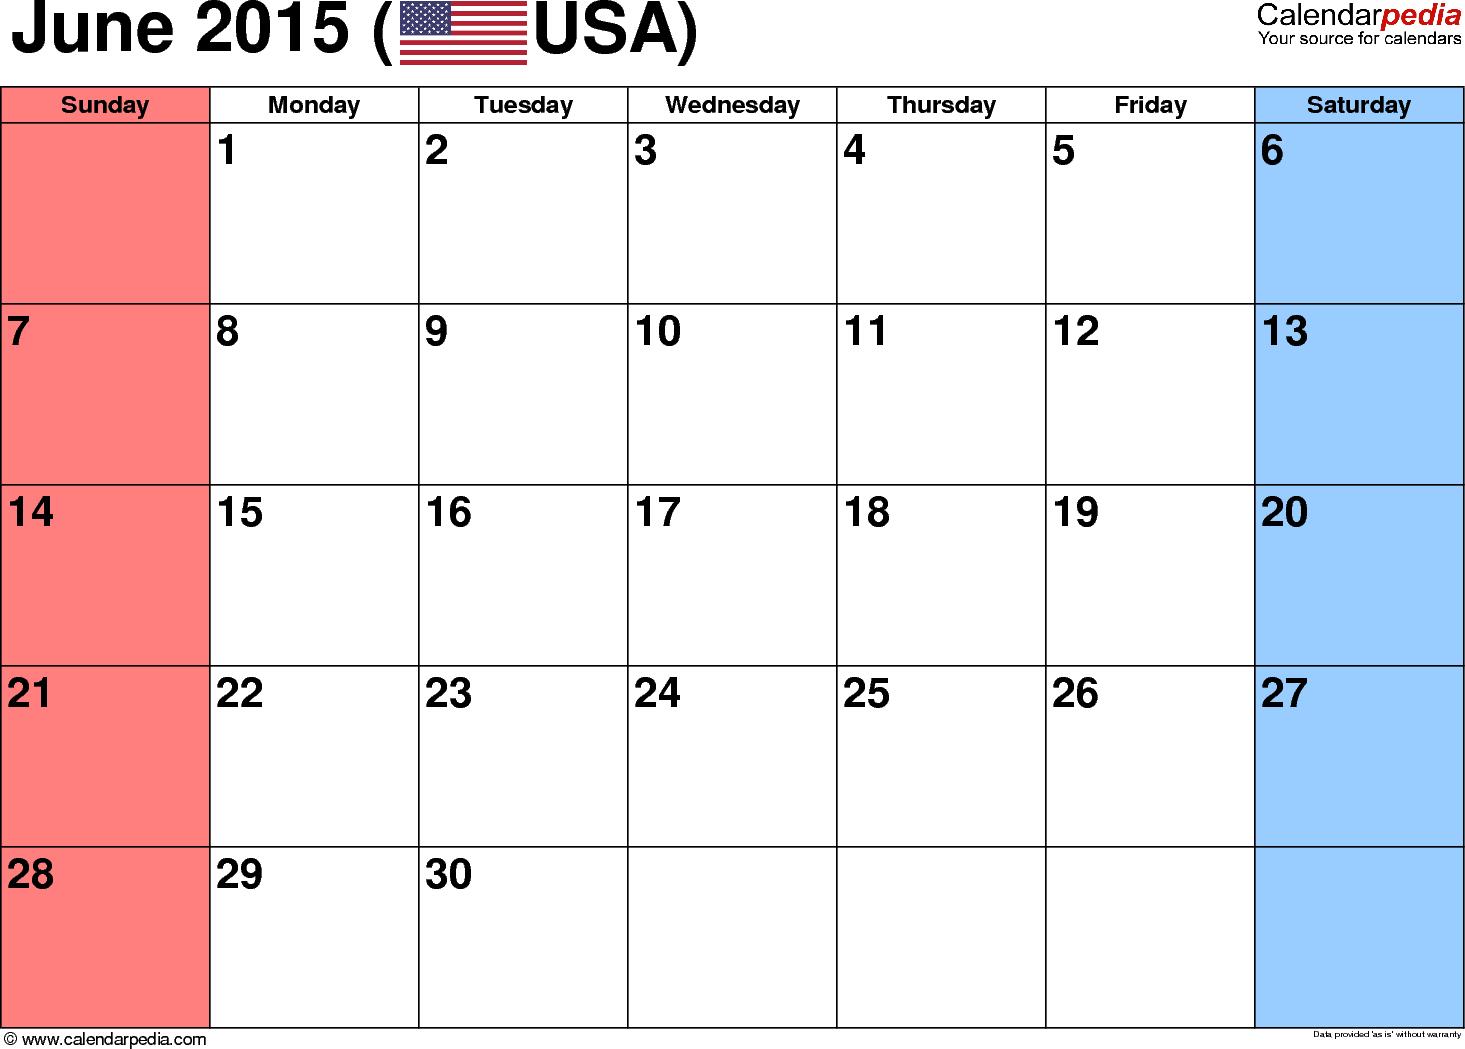 Blank June 2015 calendar